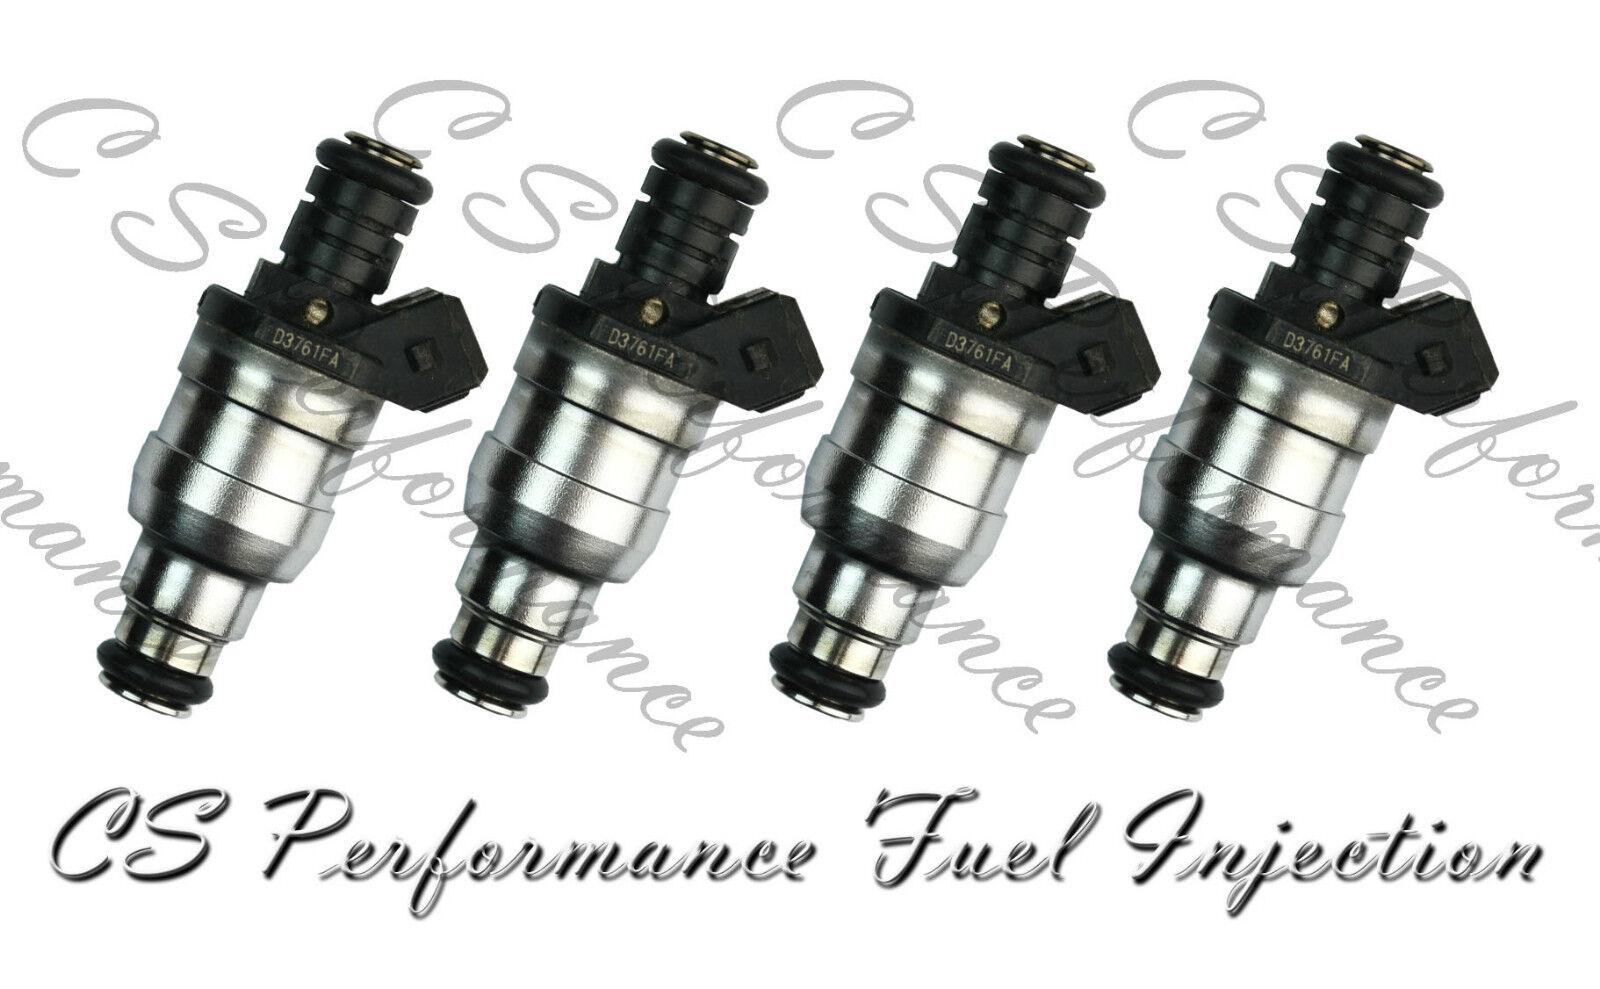 OEM Siemens Fuel Injectors Set 4 04891573AB Rebuilt by Master ASE Mechanic USA